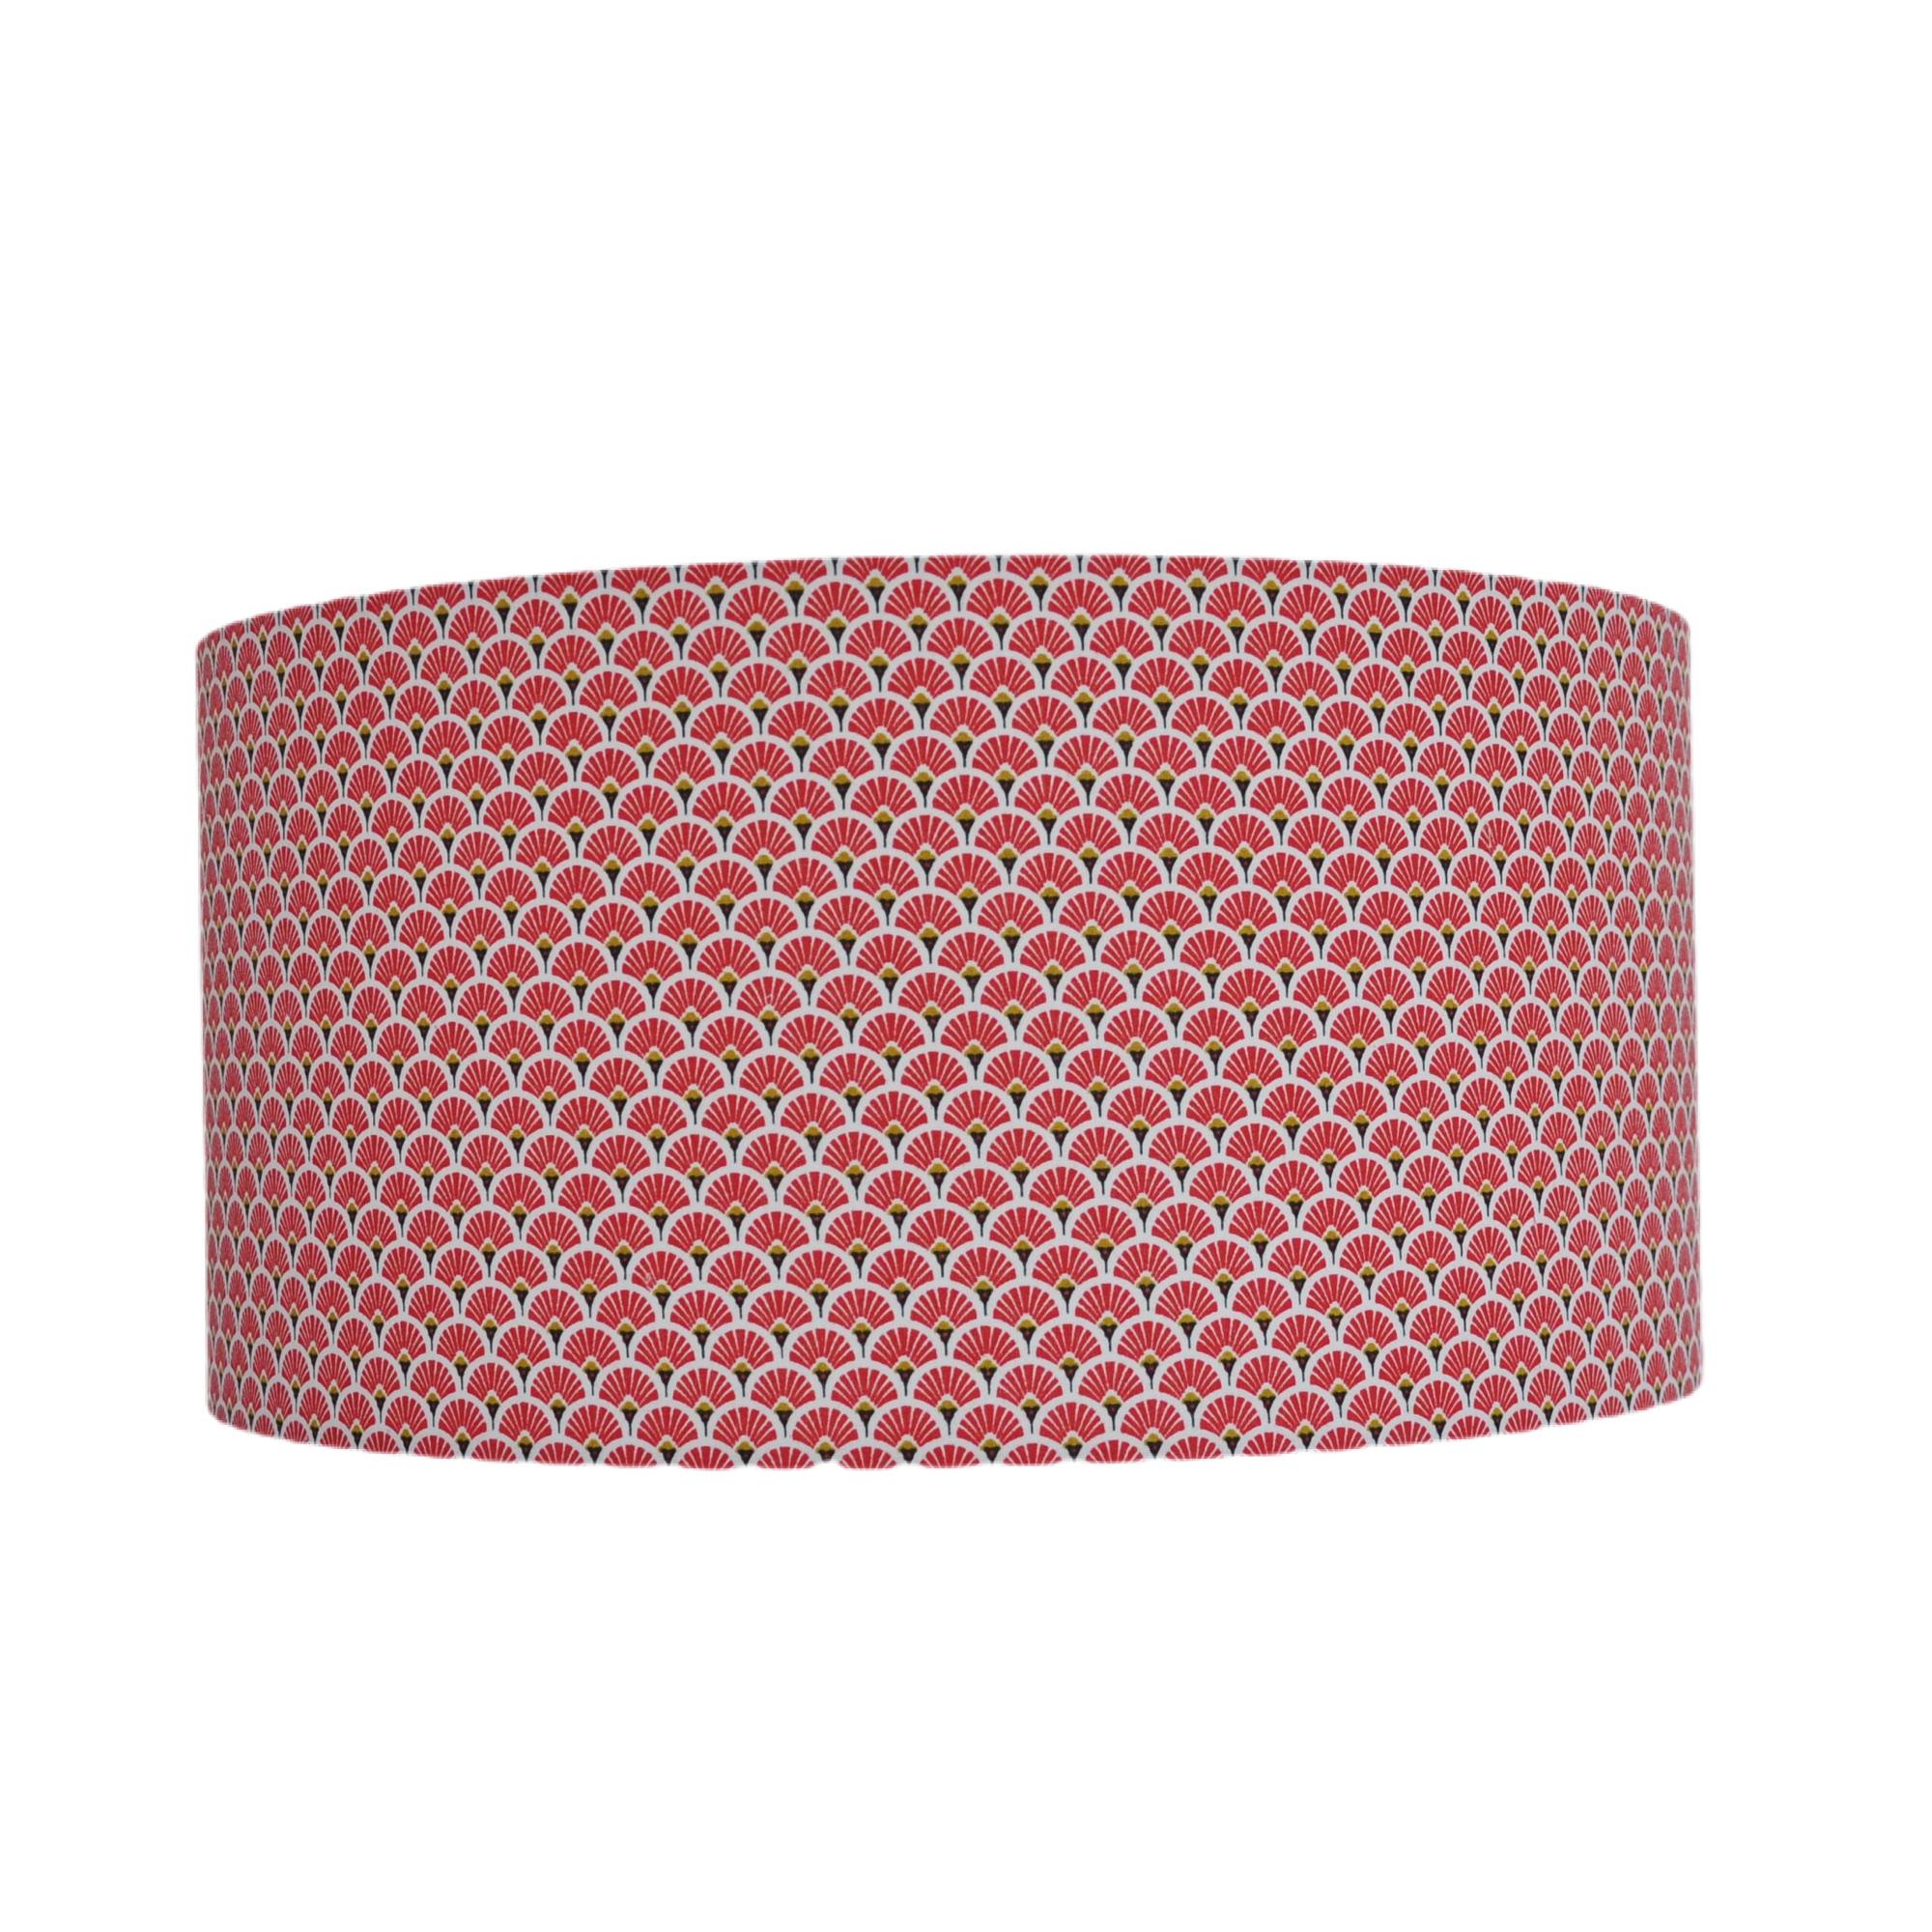 Suspension eventail rouge et or diamètre 45 cm